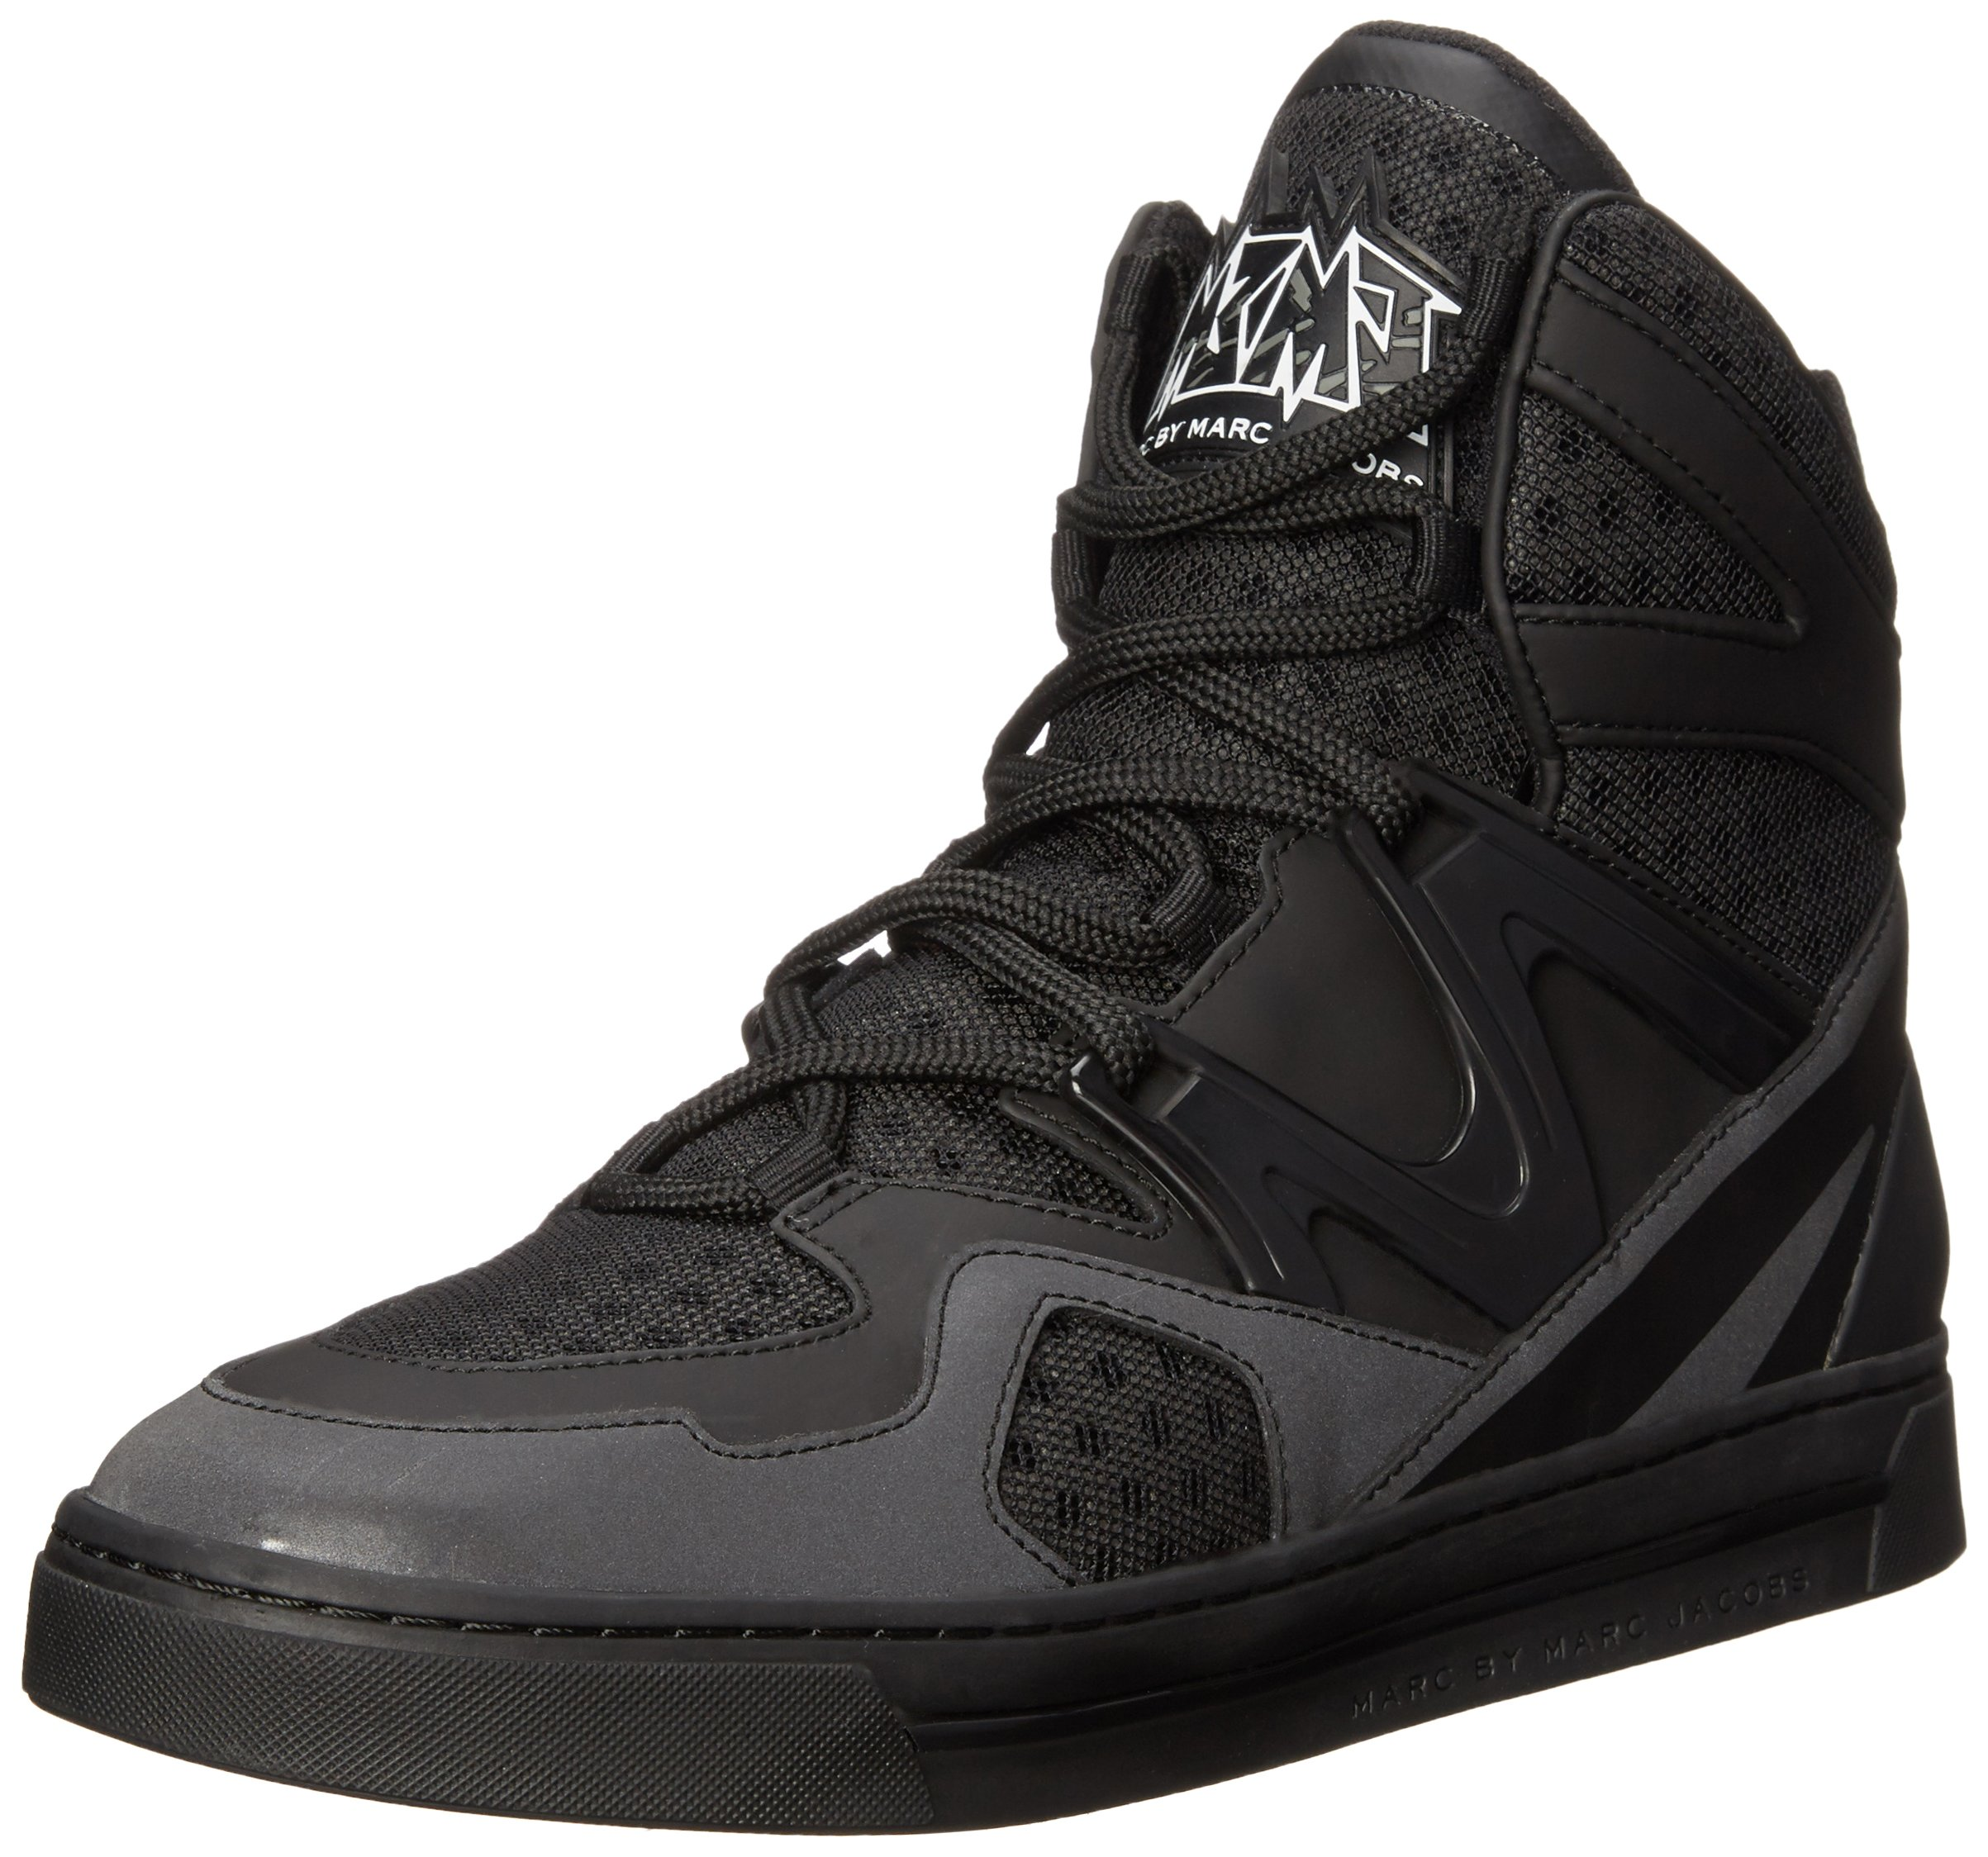 Marc by Marc Jacobs Women's Ninja Hi-Top Fashion Sneaker, Black, 37 EU/7 M US